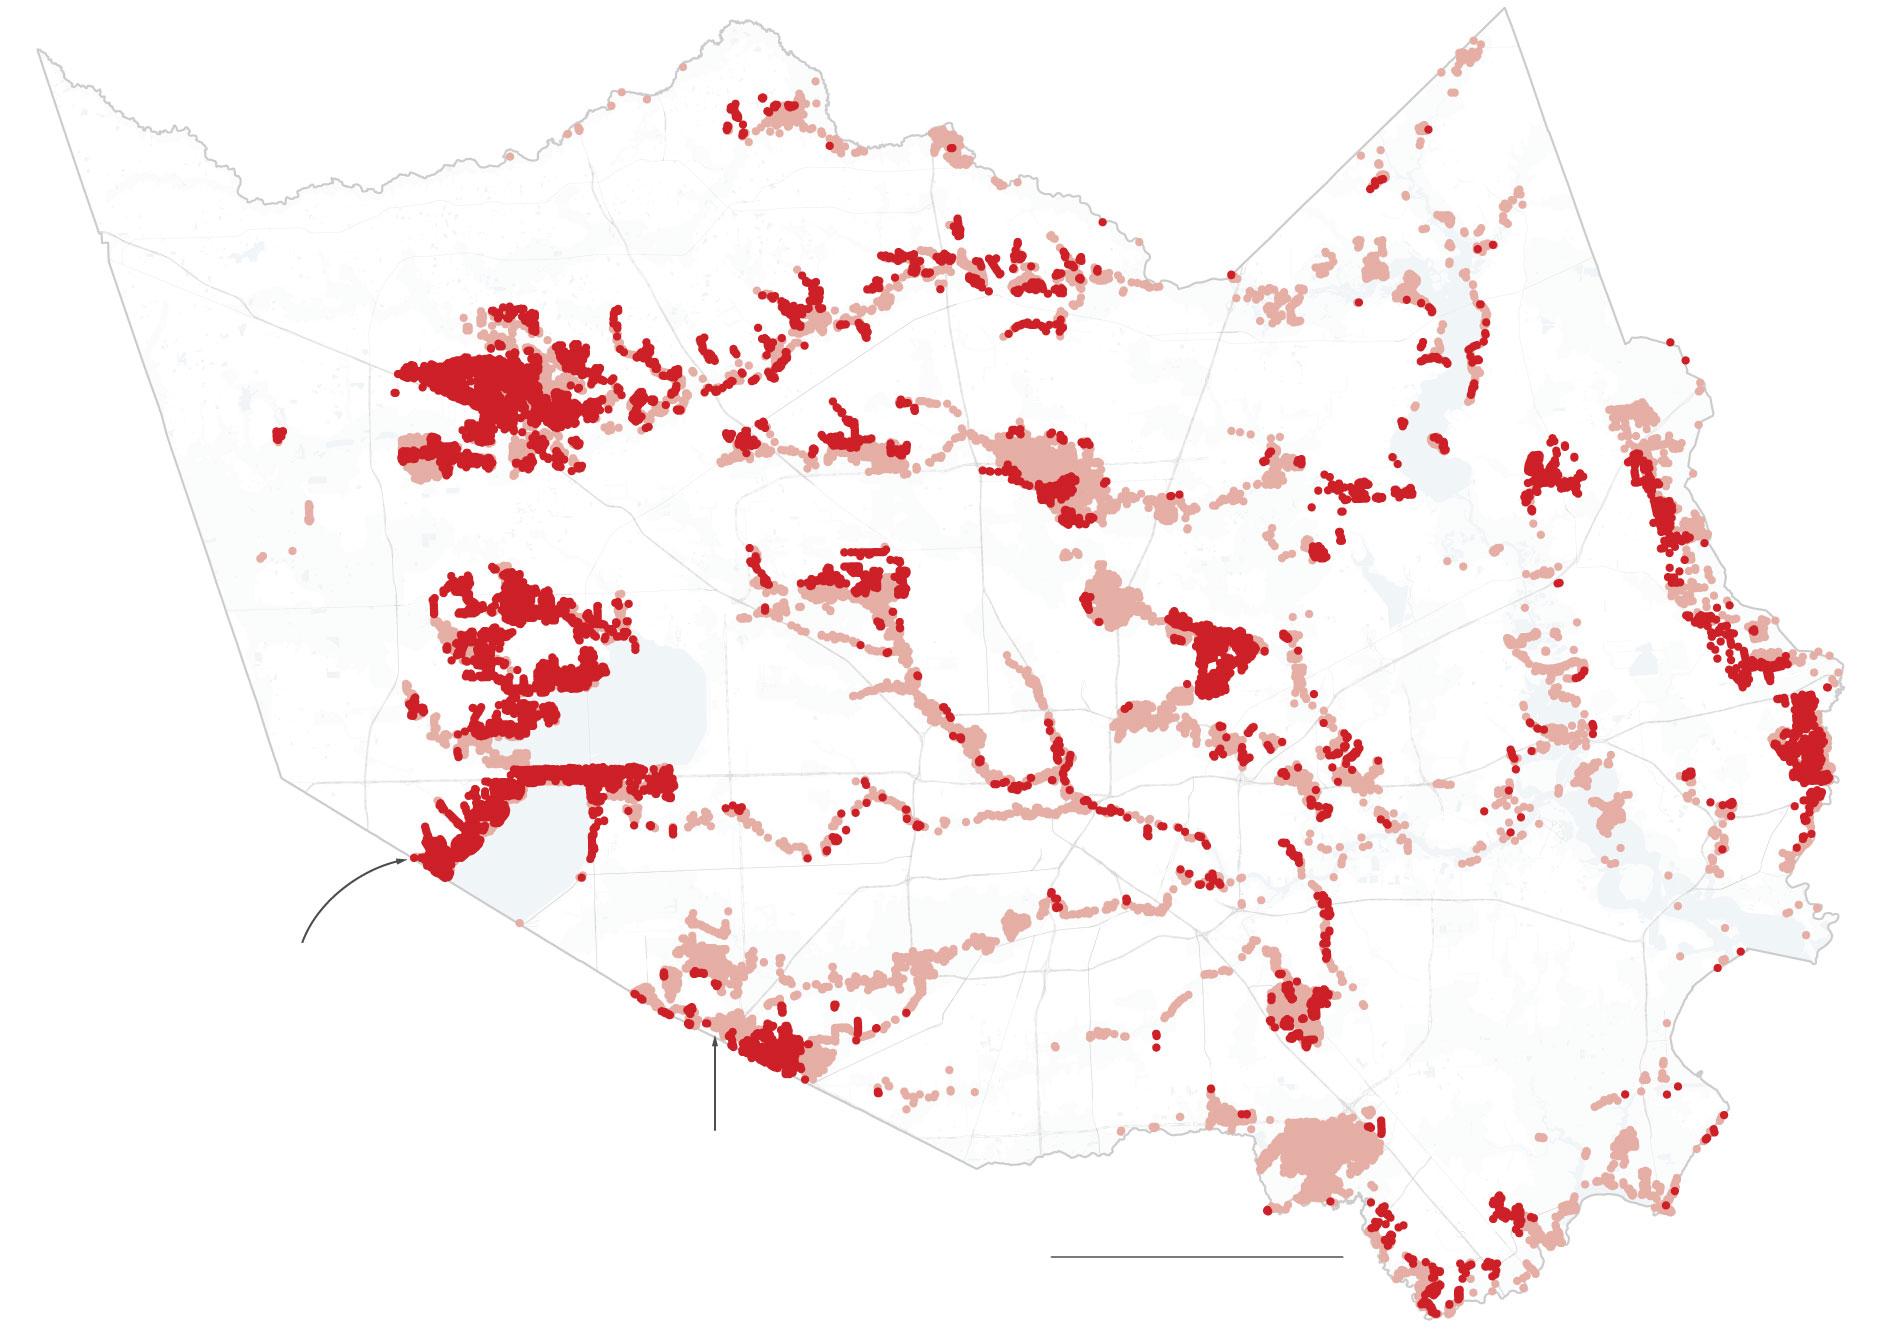 Water Damage From Hurricane Harvey Extended Far Beyond Flood Zones - Fema Flood Maps Texas